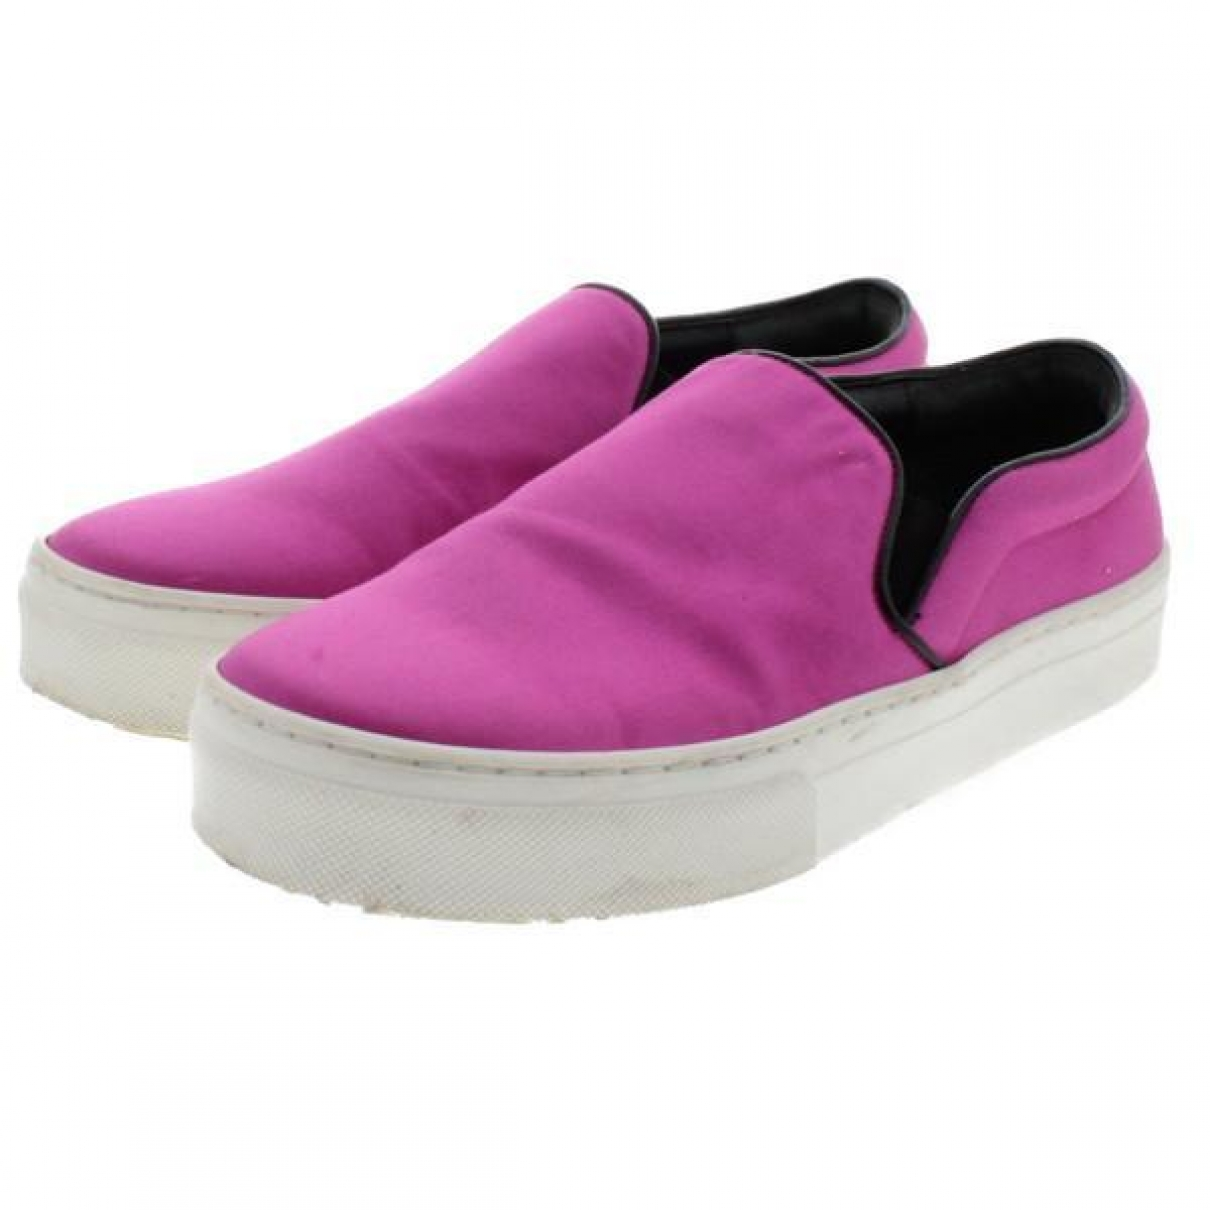 Celine - Baskets   pour femme en toile - violet